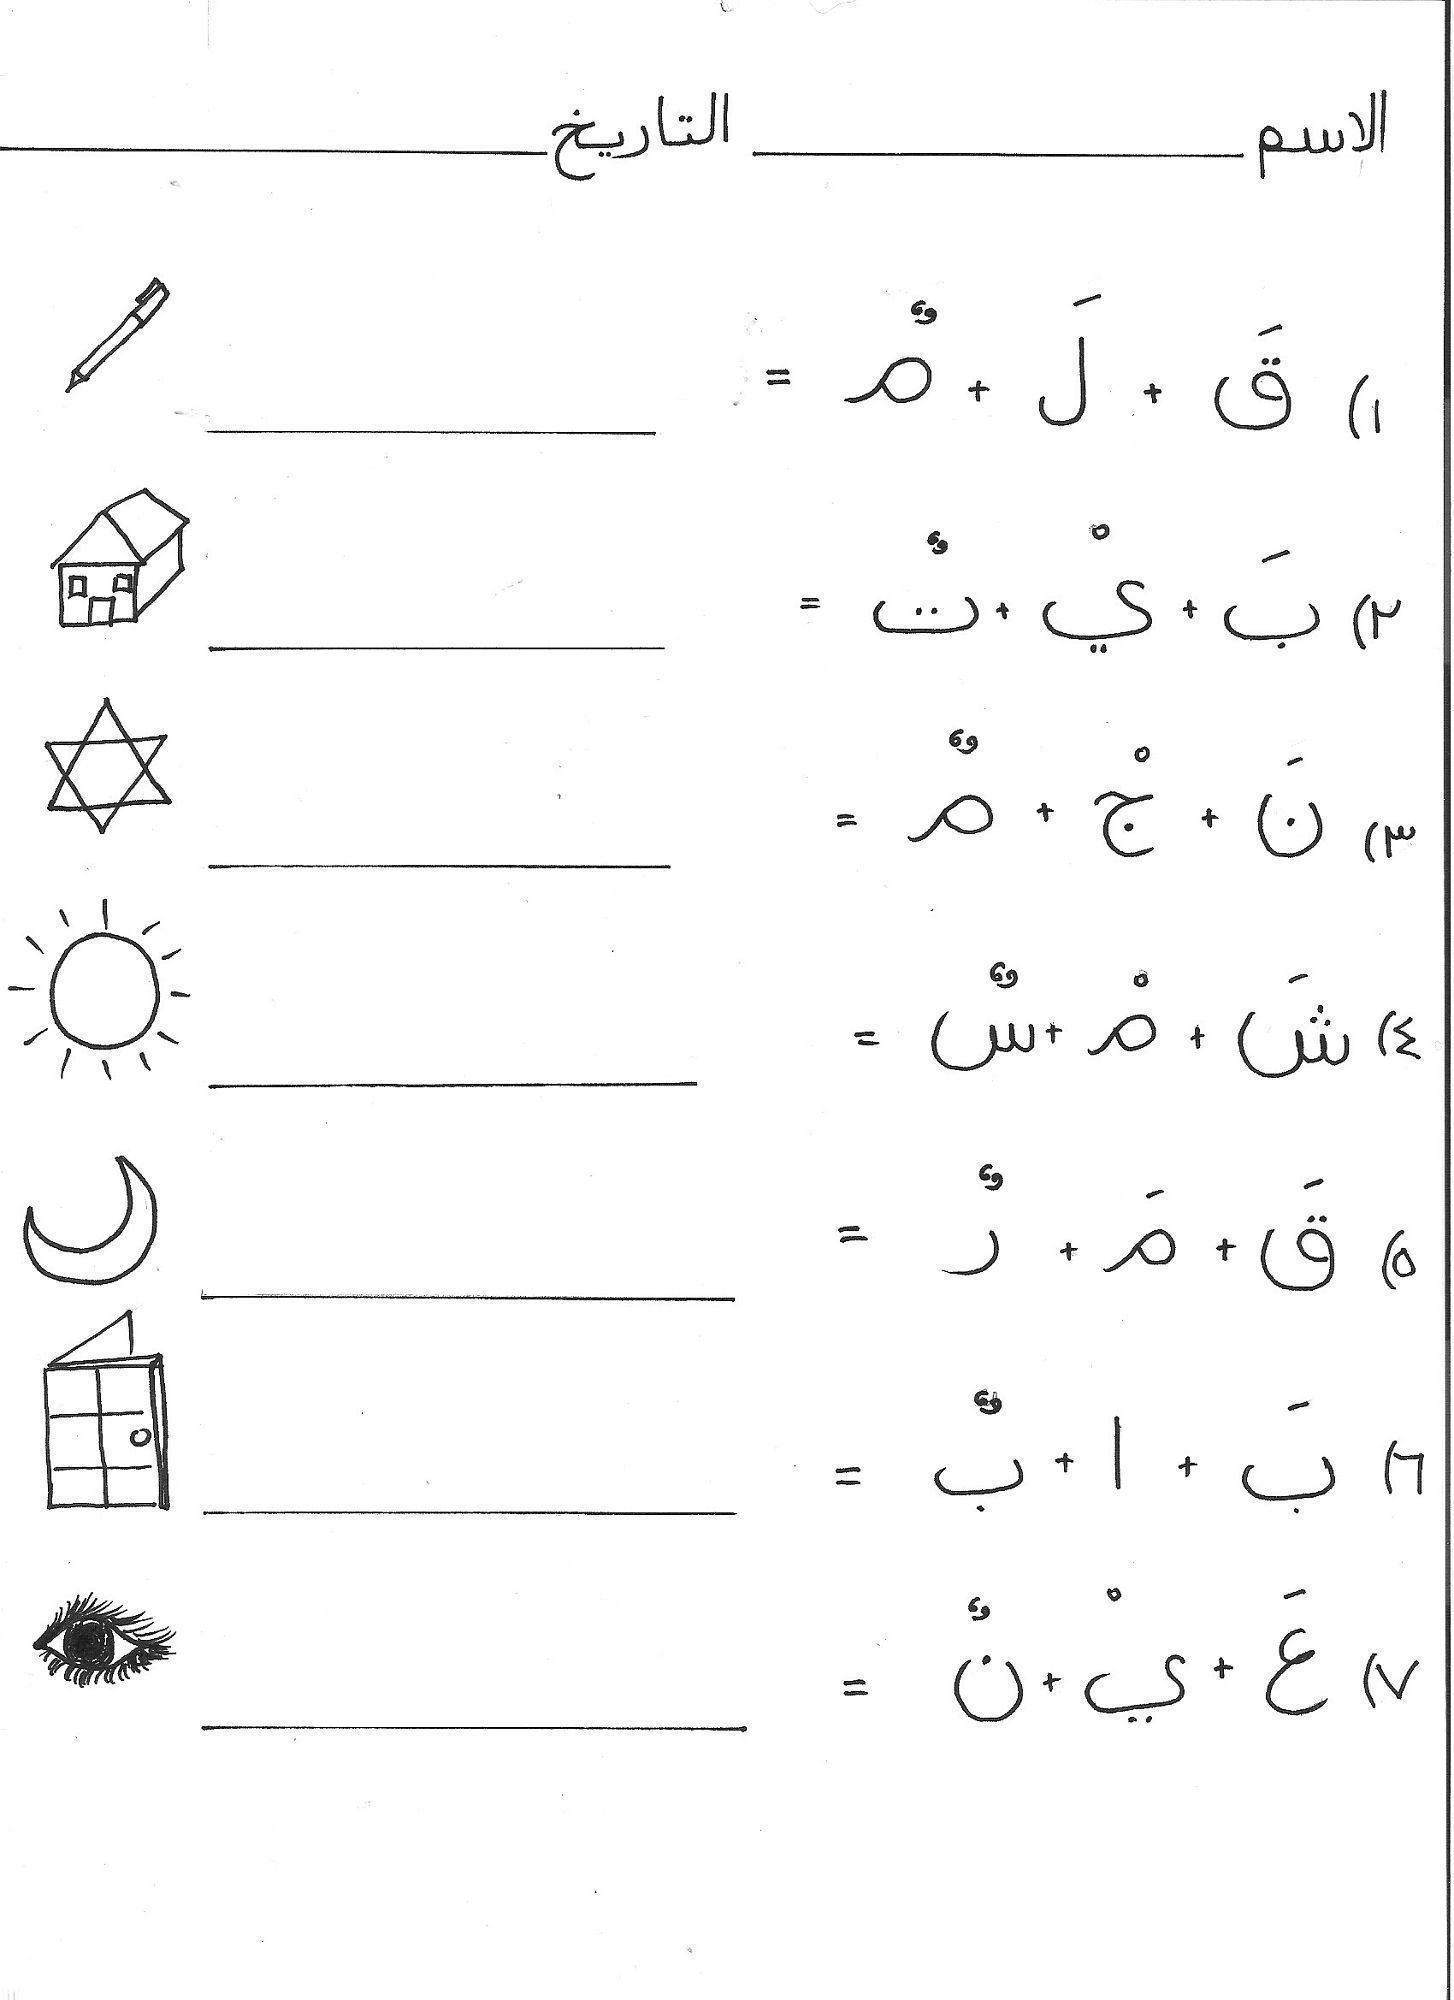 Arabic Alphabet Worksheets | Activity Shelter #learnarabicactivities ...